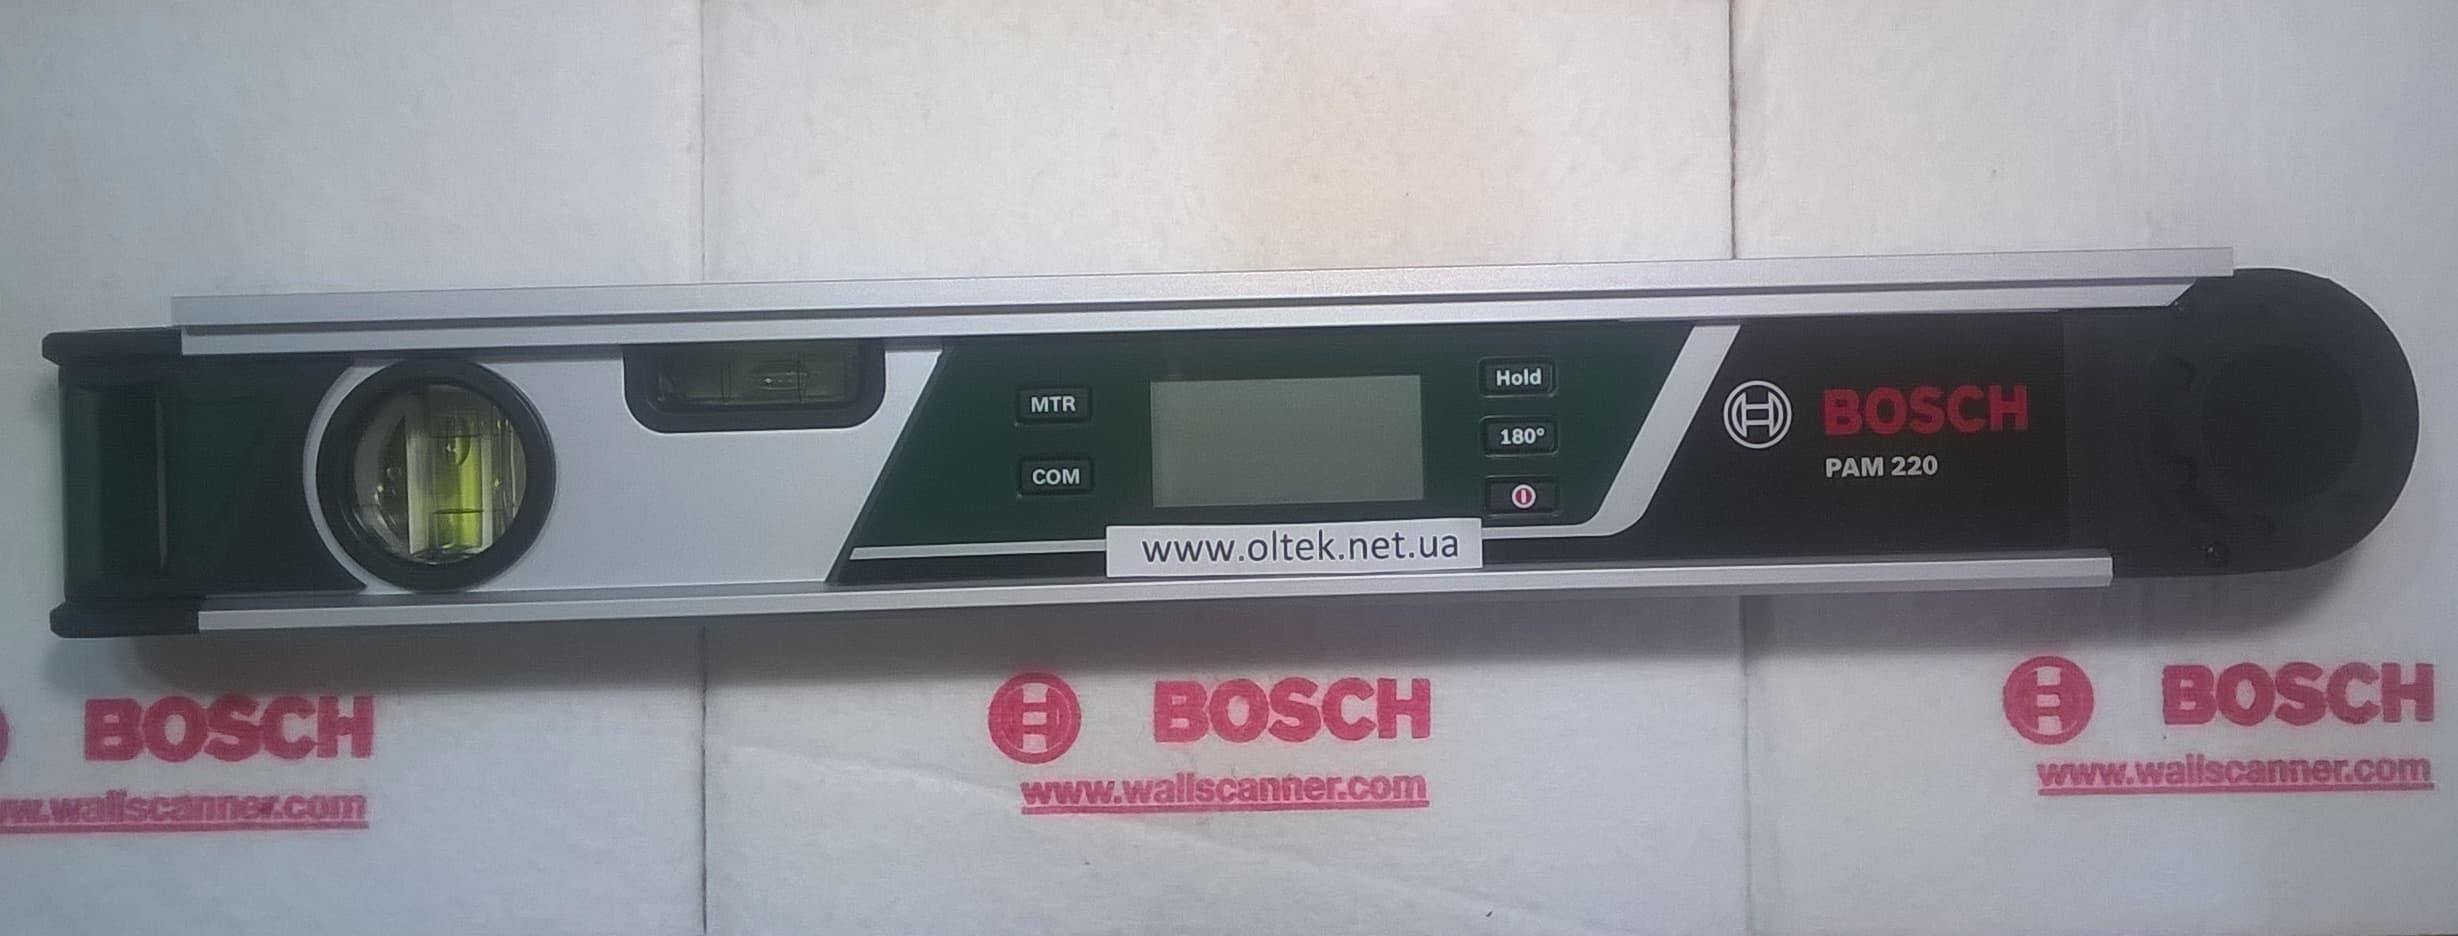 Bosch PAM 220